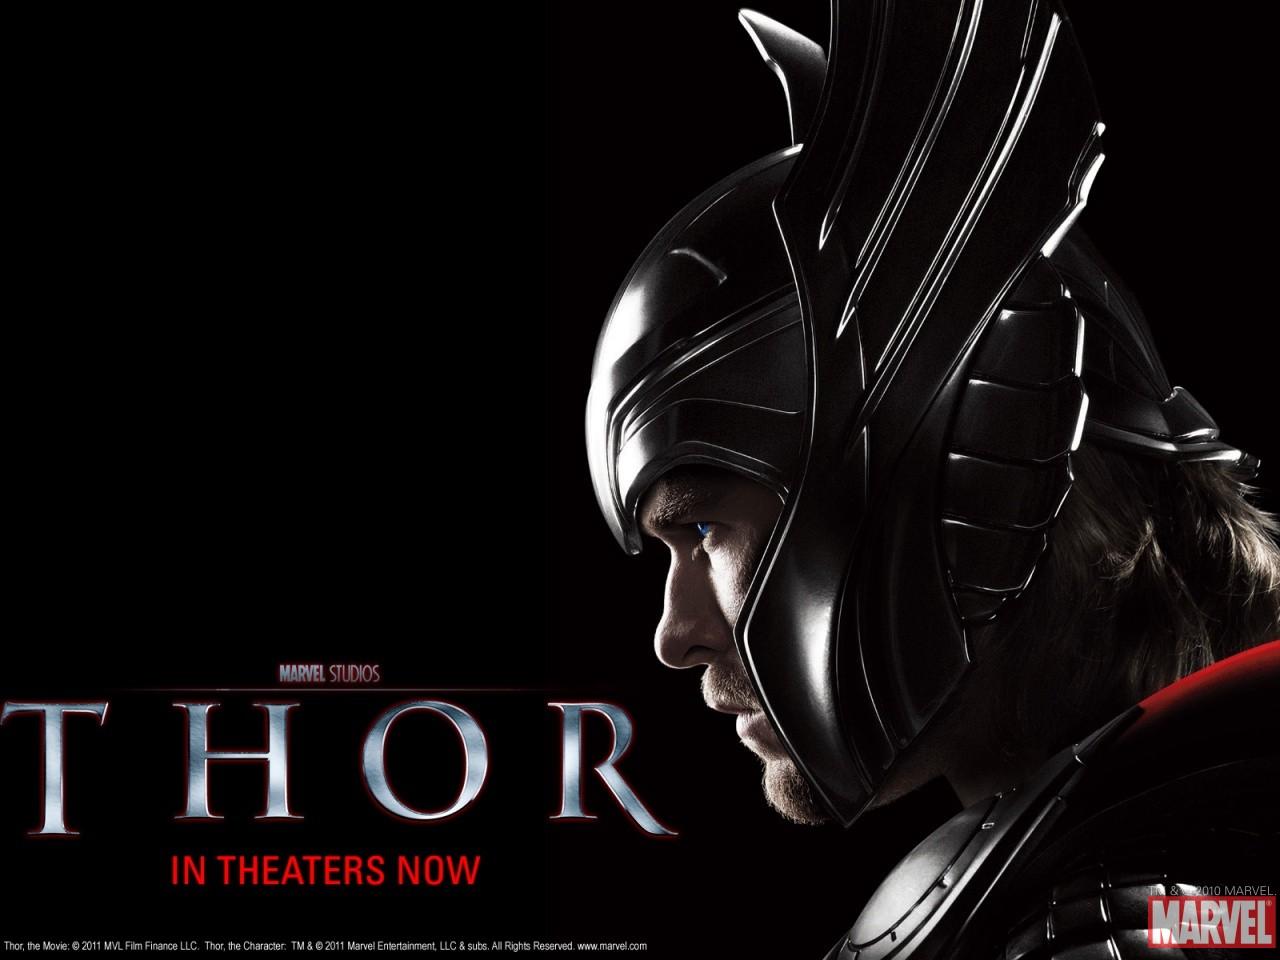 Thor Movie Wallpaper #20 | Apps | Marvel.com